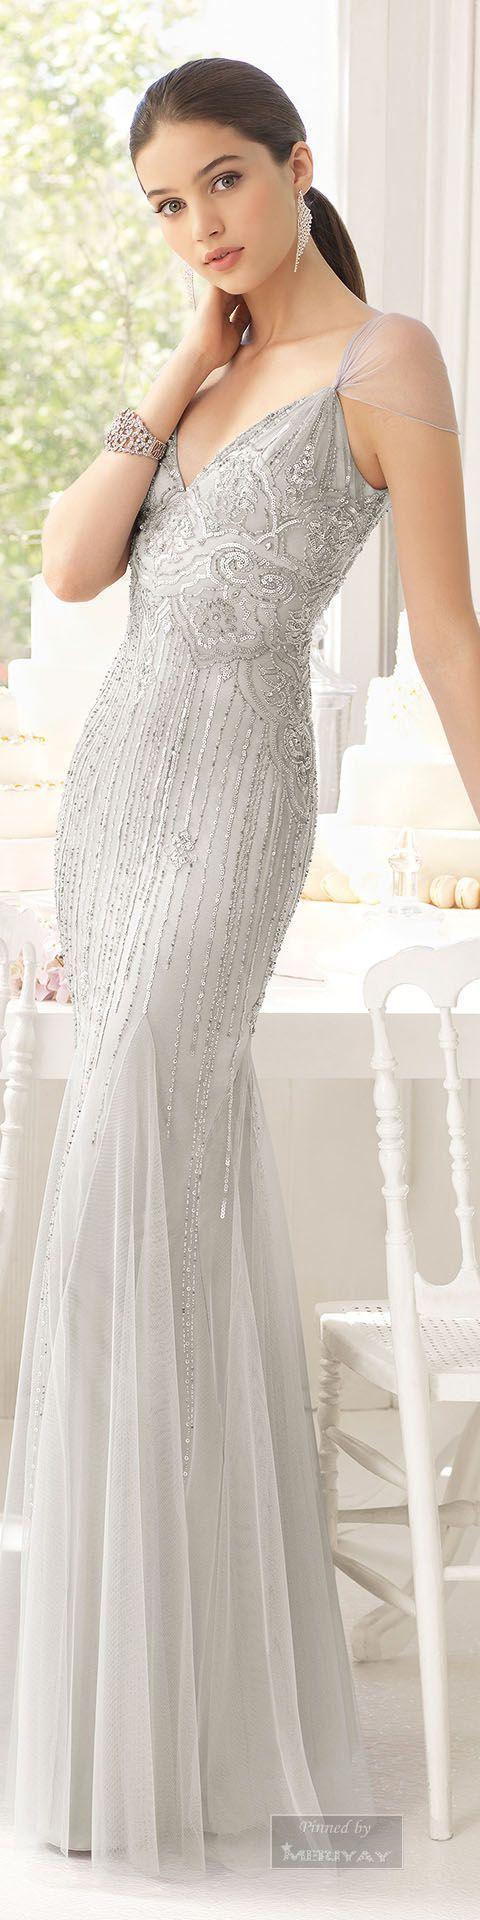 Luxury Design Dress 2015 | Prom Dress